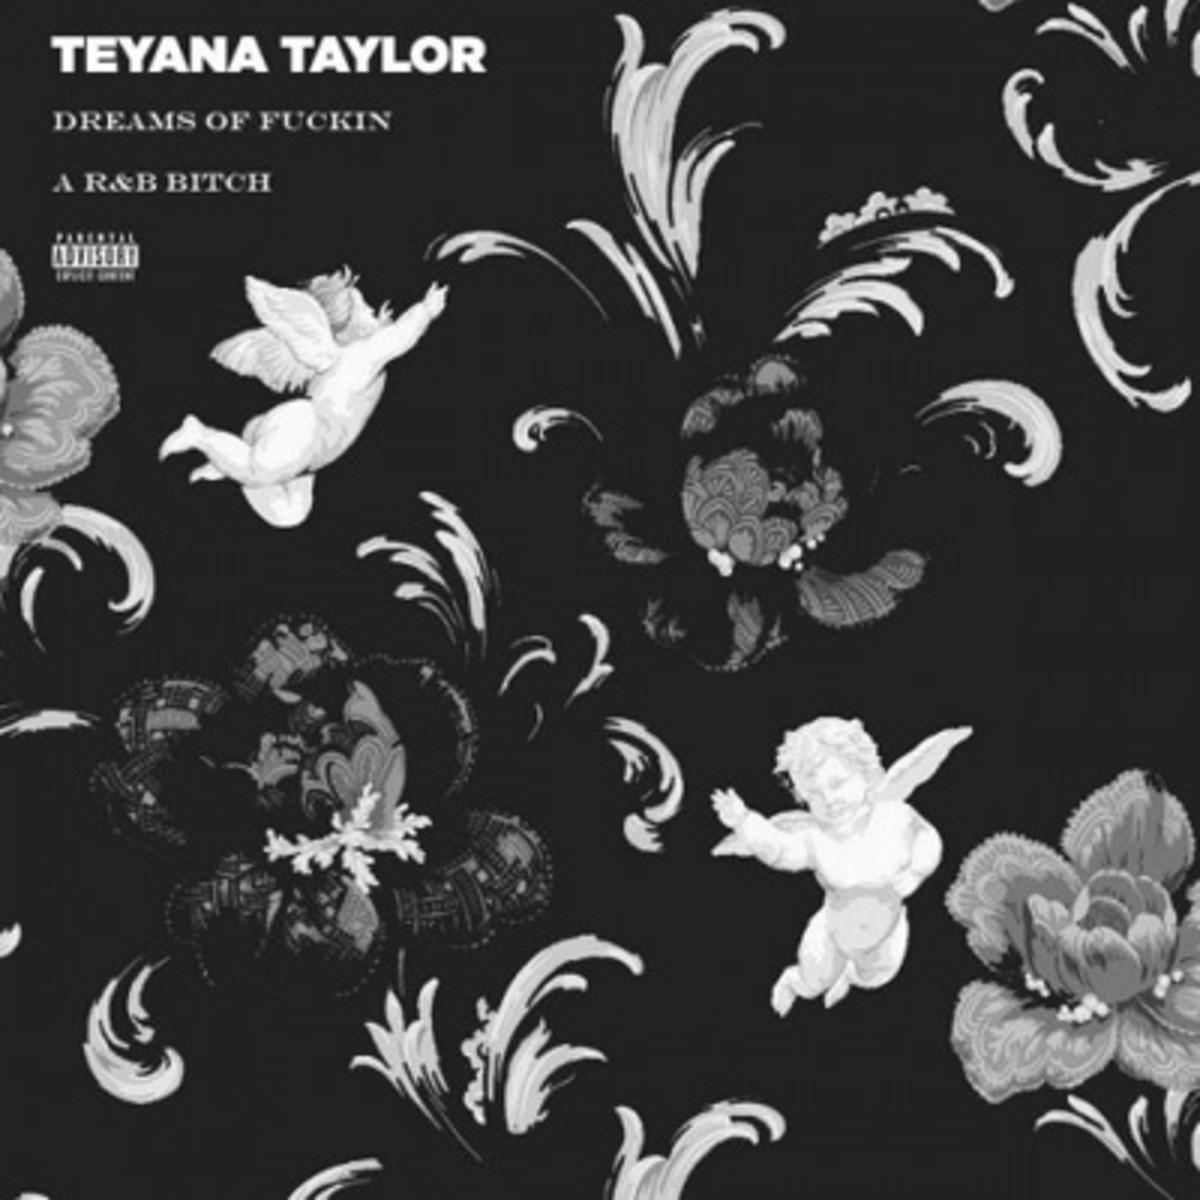 teyana-taylor-dreams1.jpg